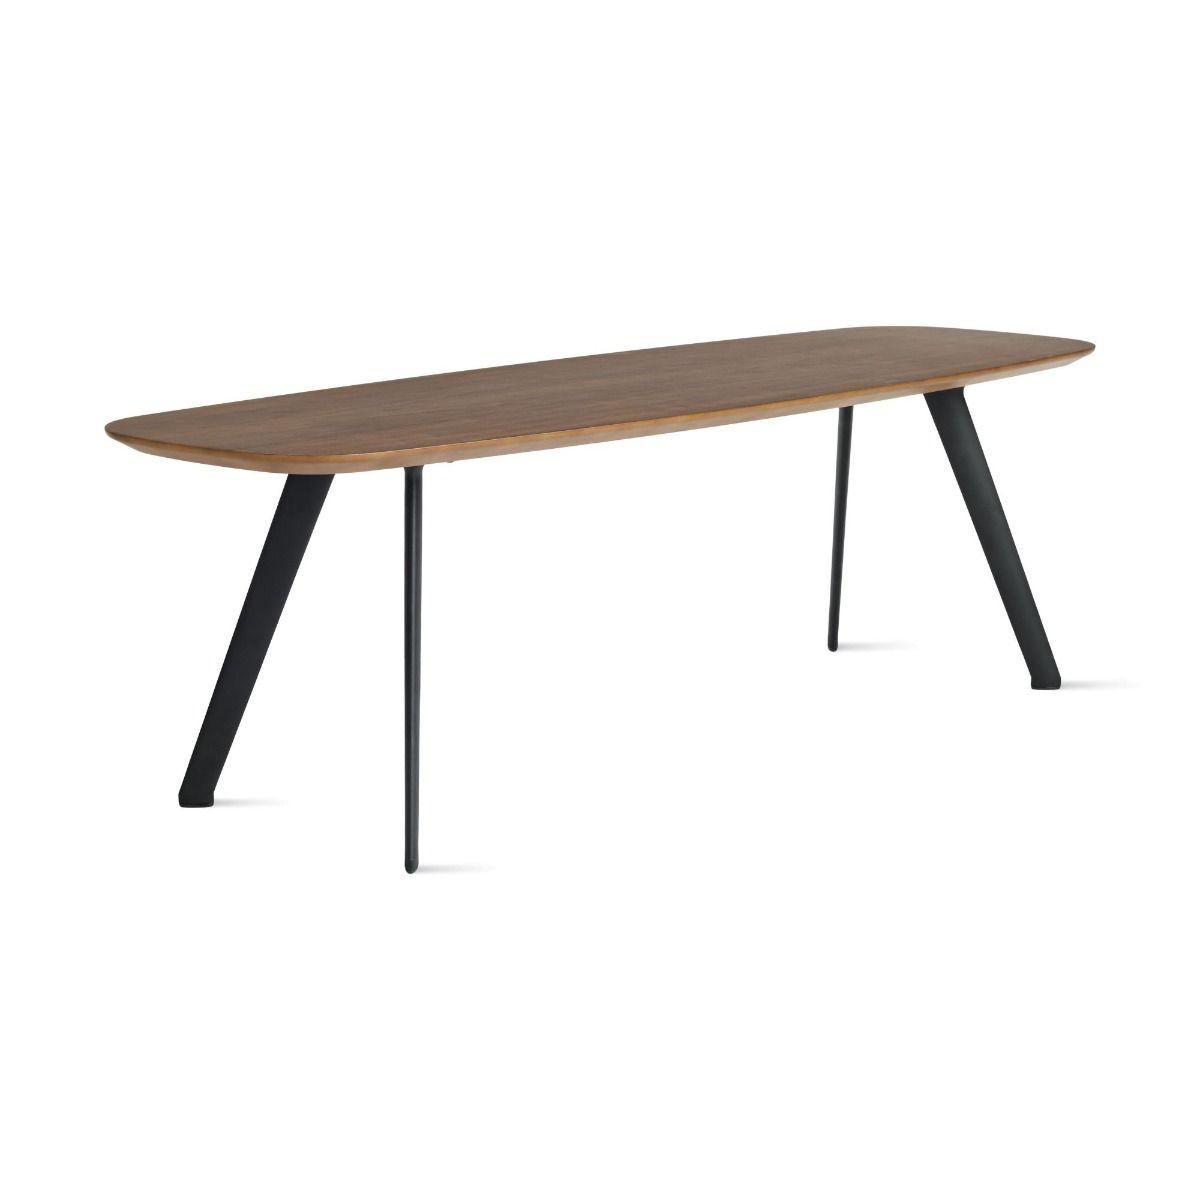 Stua Solapa coffee table walnut 40cm x 120cm